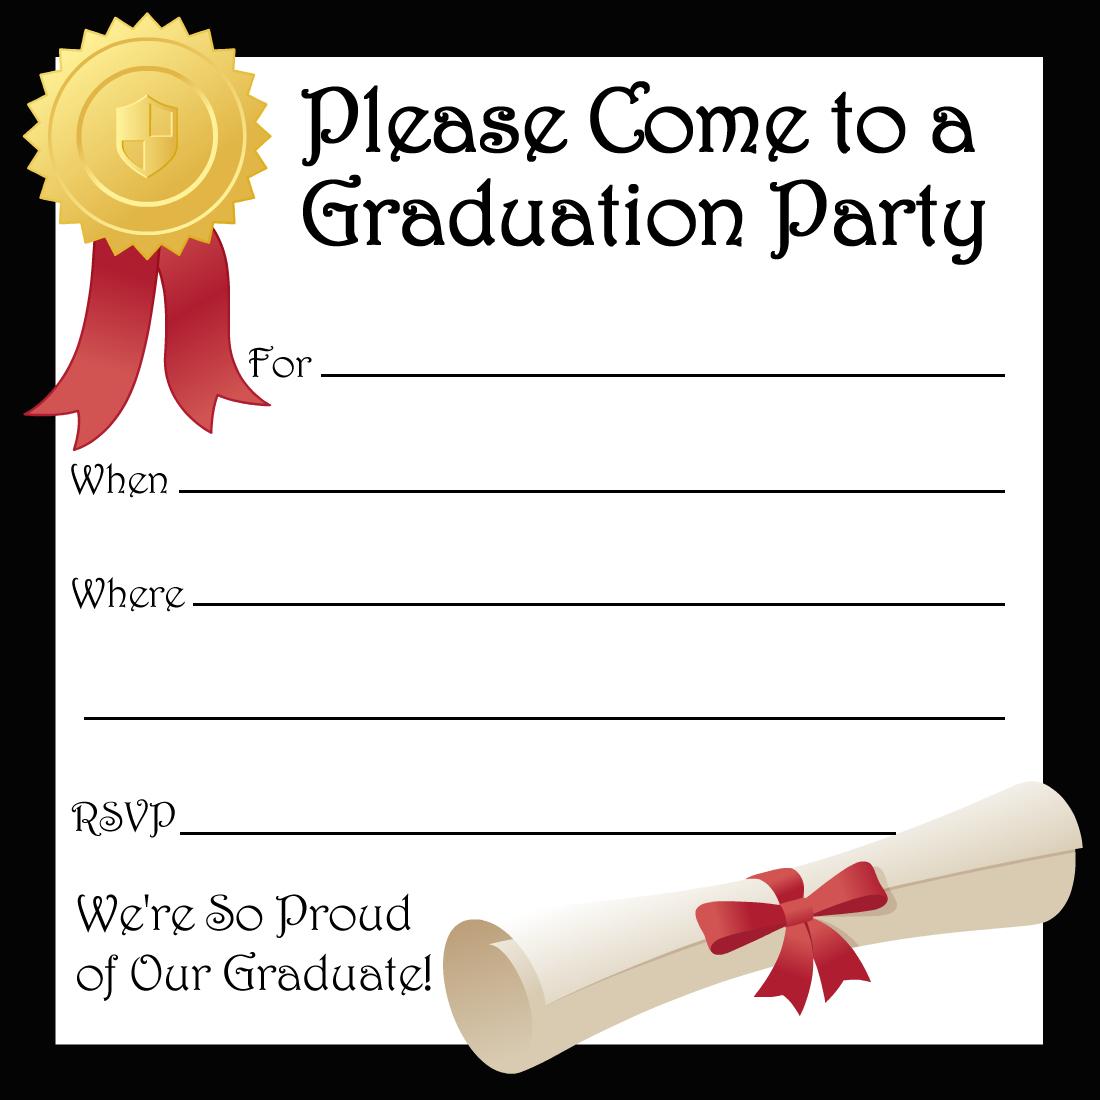 Free Printable Graduation Party Invitations | High School Graduation - Free Online Printable Graduation Invitation Maker